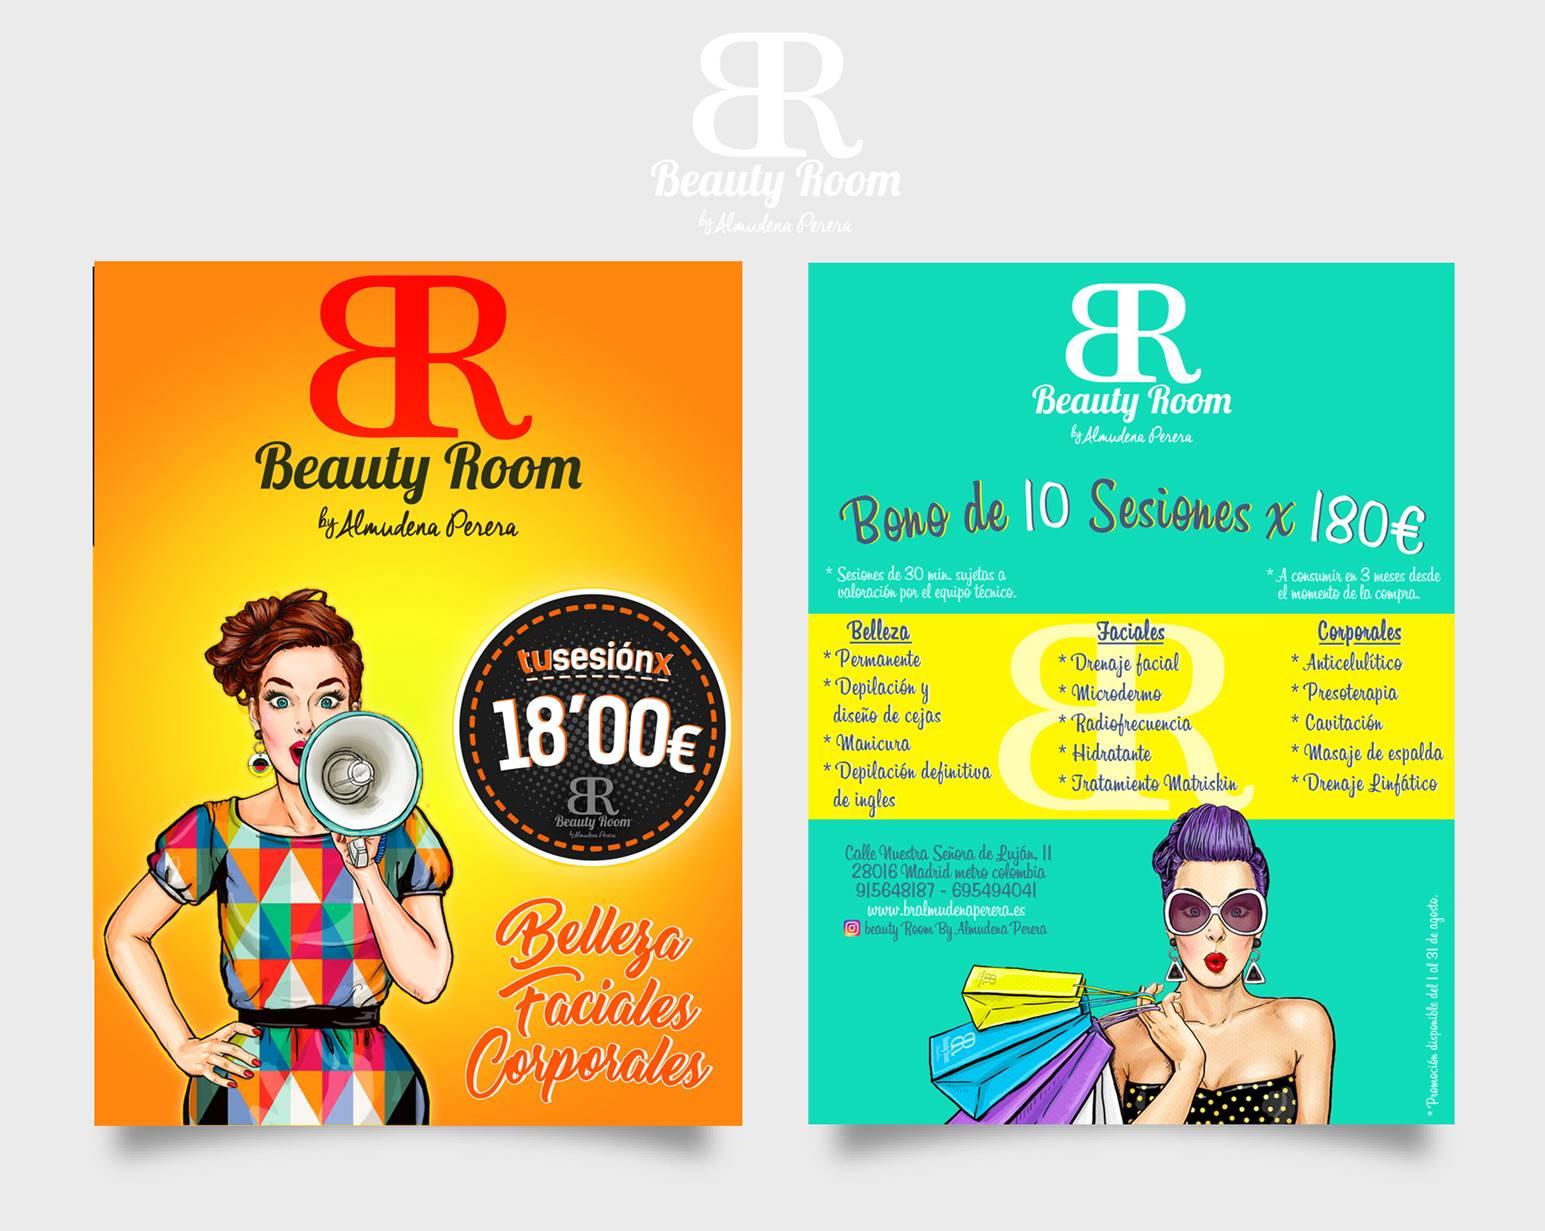 Beauty Room By Almudena Perera 18